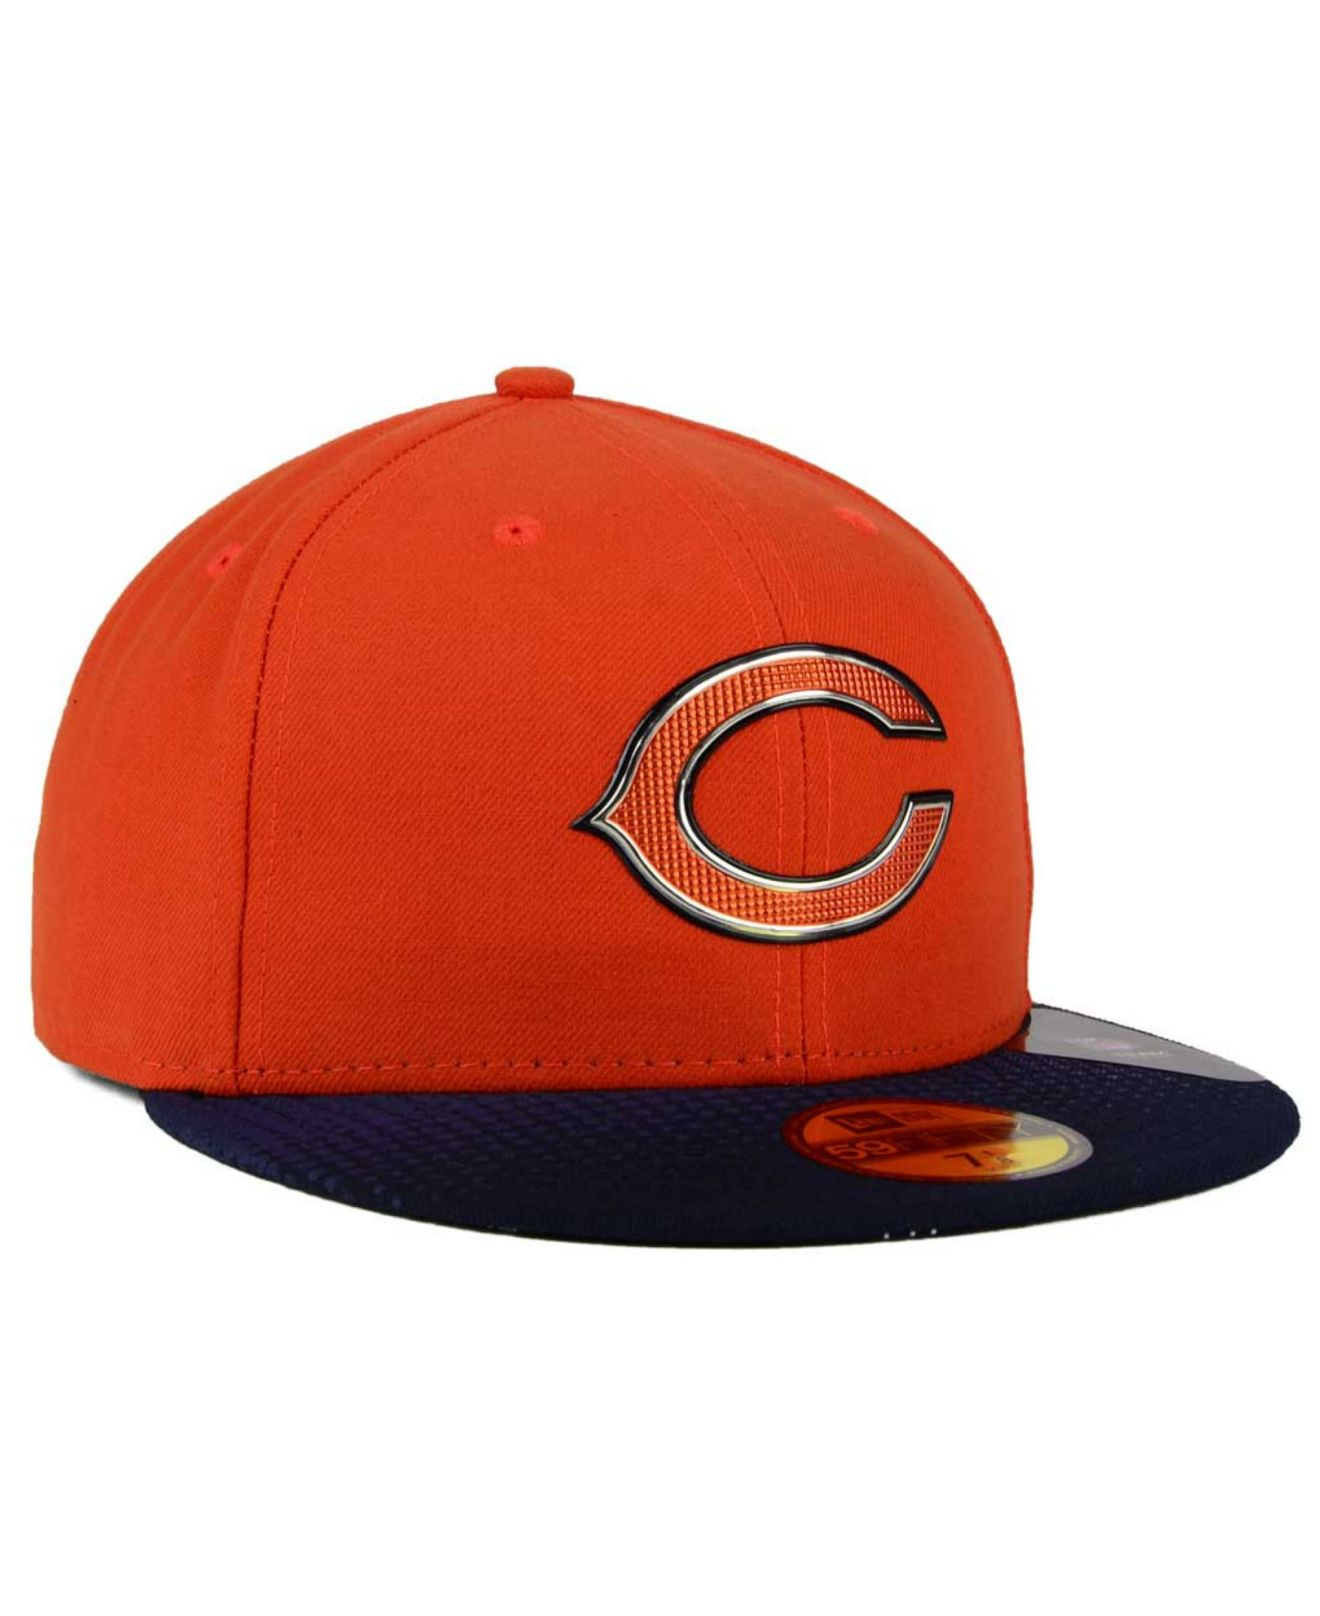 sports shoes bcdcf 66dd4 KTZ Chicago Bears Draft Redo 59fifty Cap in Orange for Men - Lyst